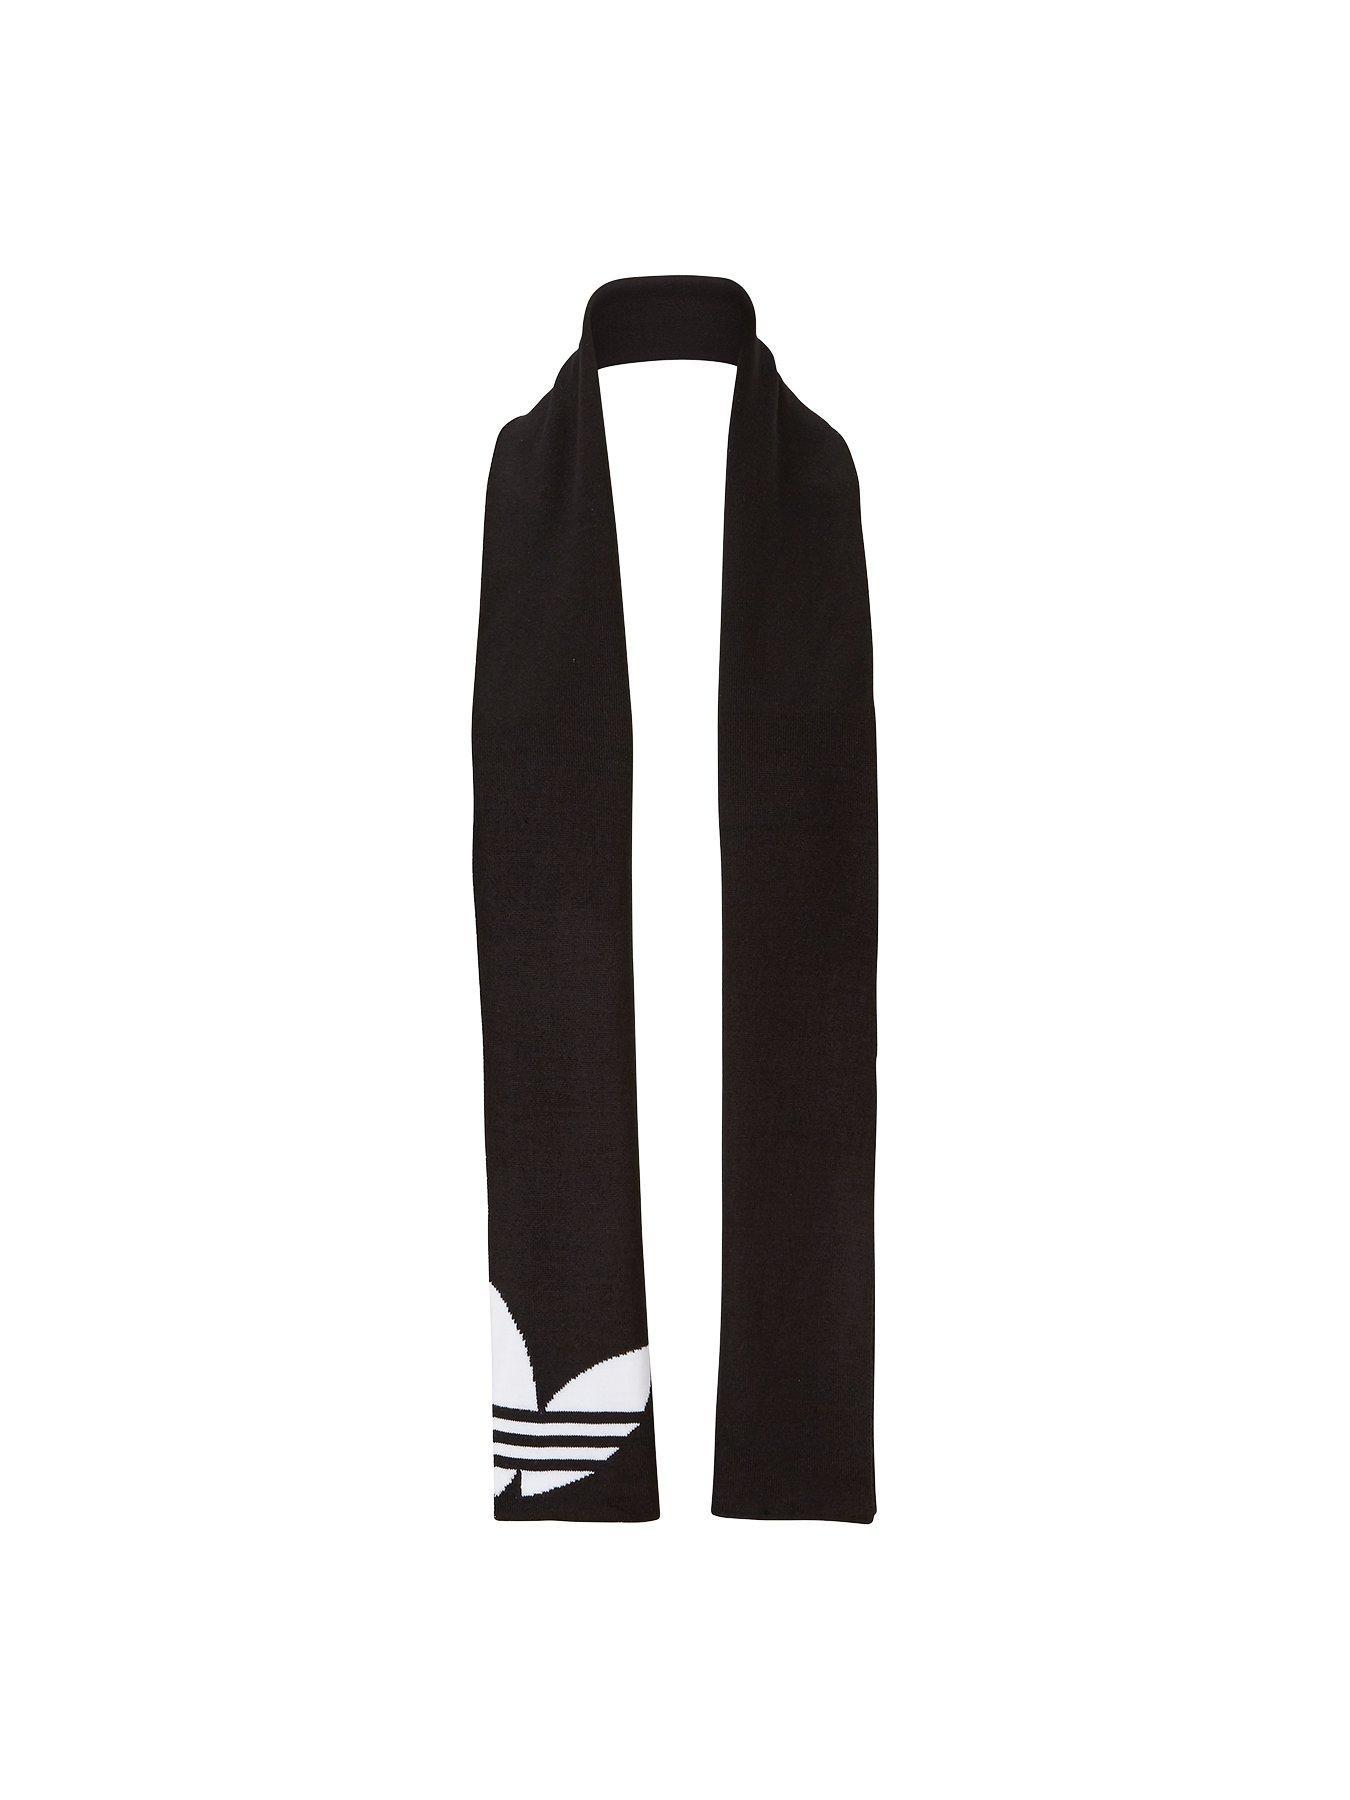 adidas originals scarf